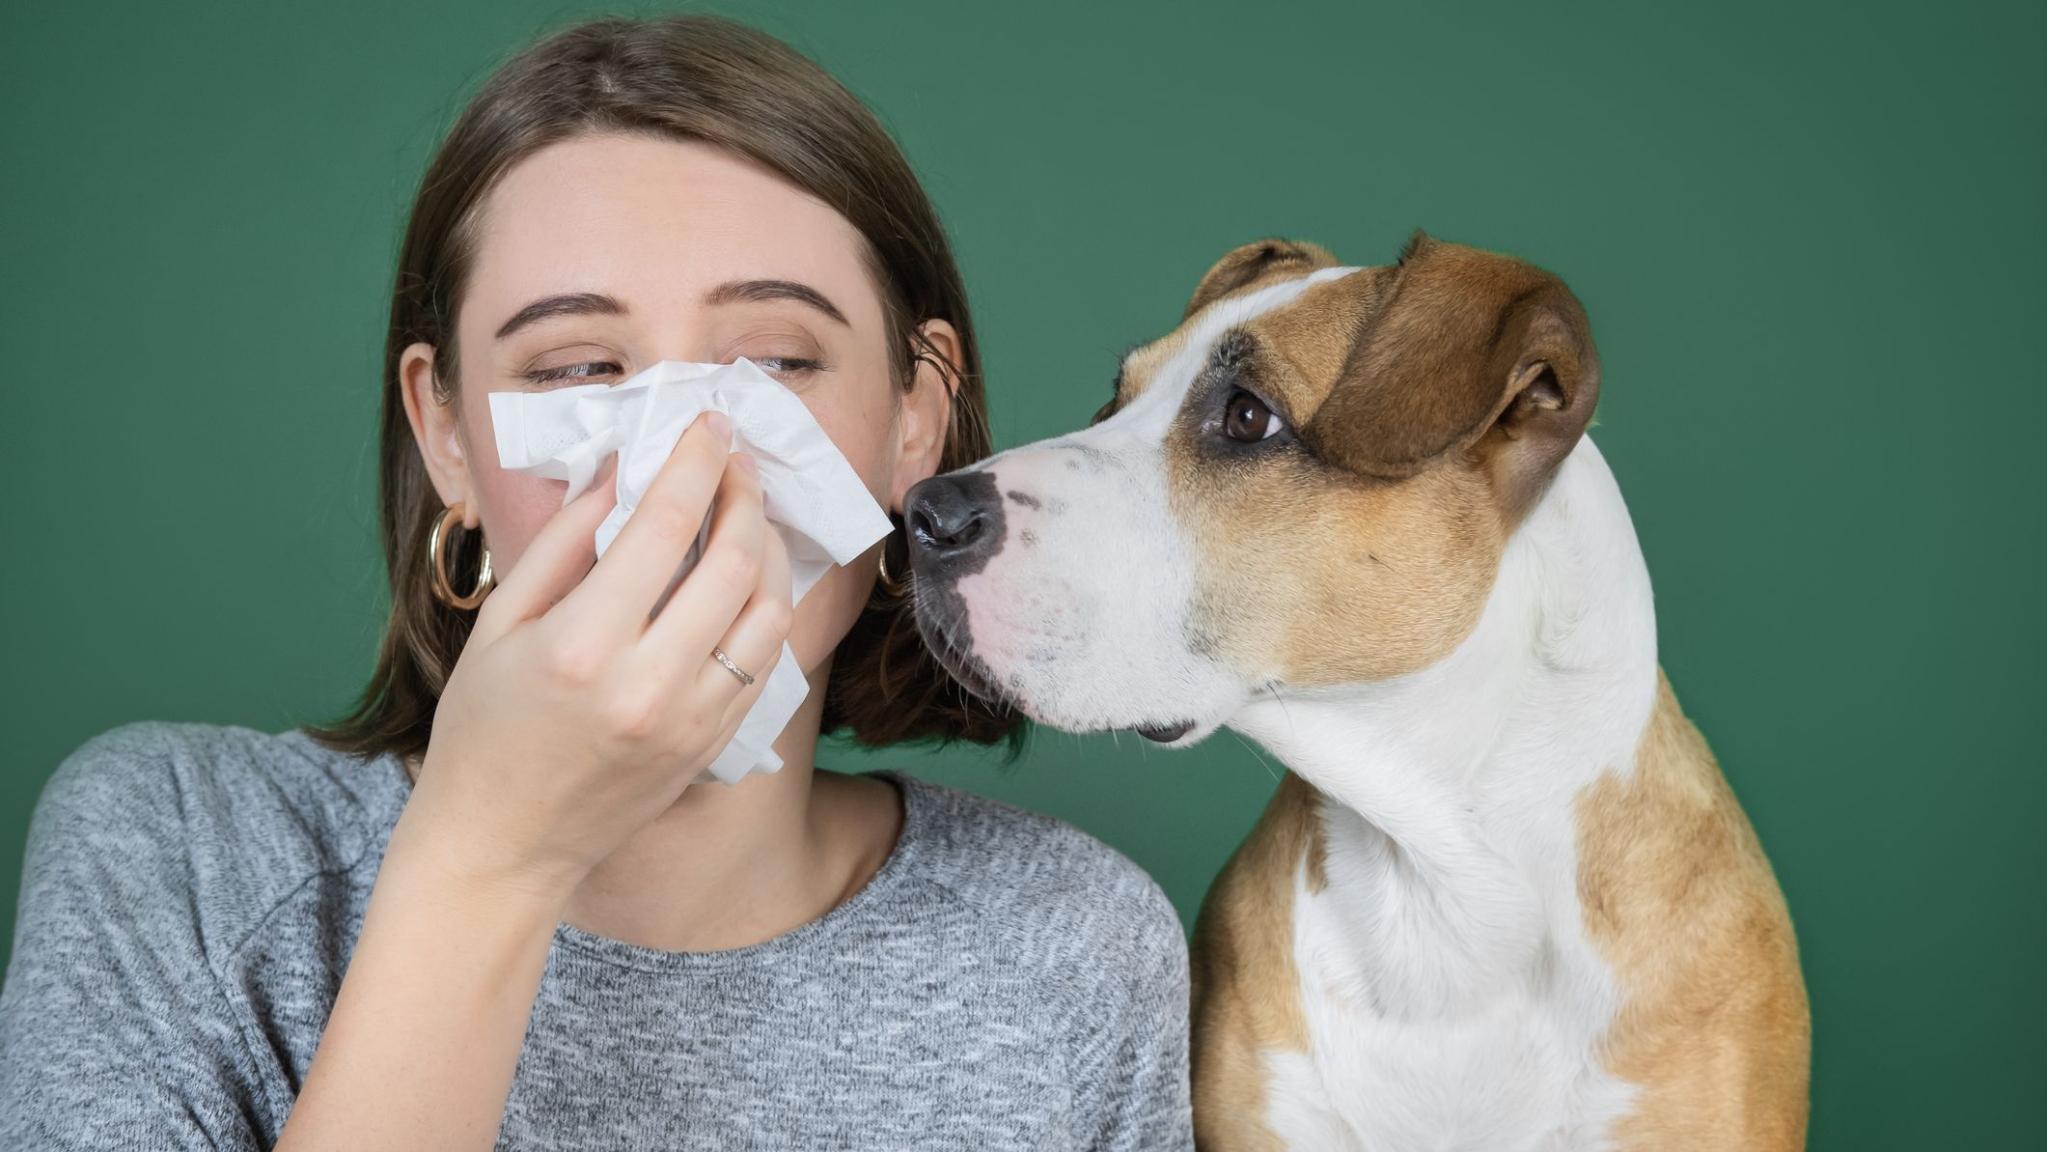 Can Your Dog Catch the Coronavirus?